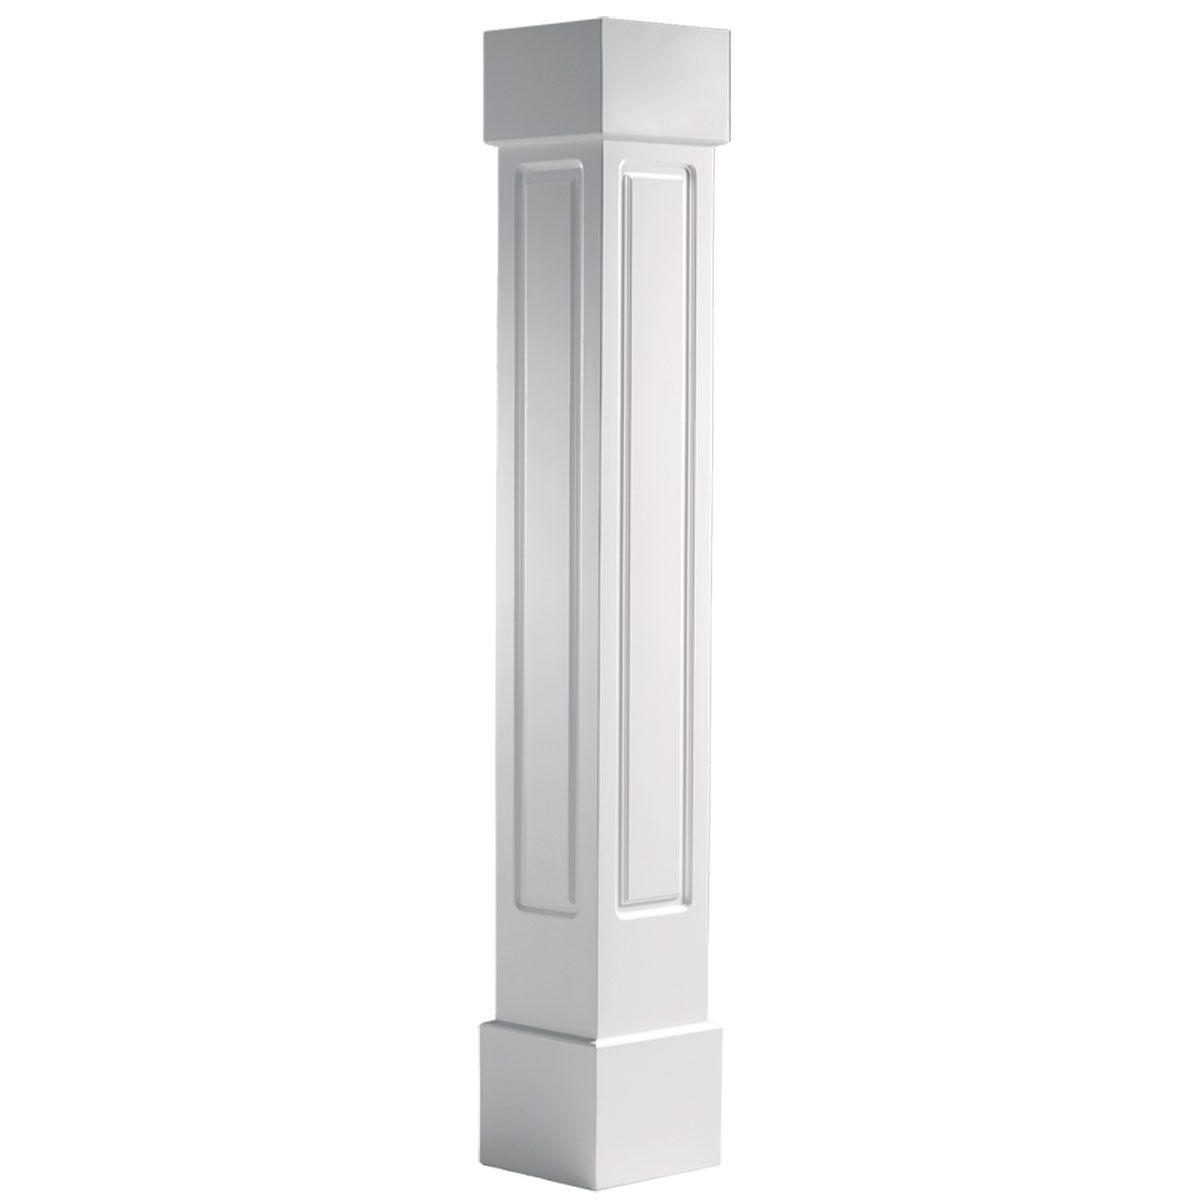 Staggering Raised Panel Molding Raised Panel Cap Molding: Endura-Craft Square Non-Tapered, Raised Panel Column